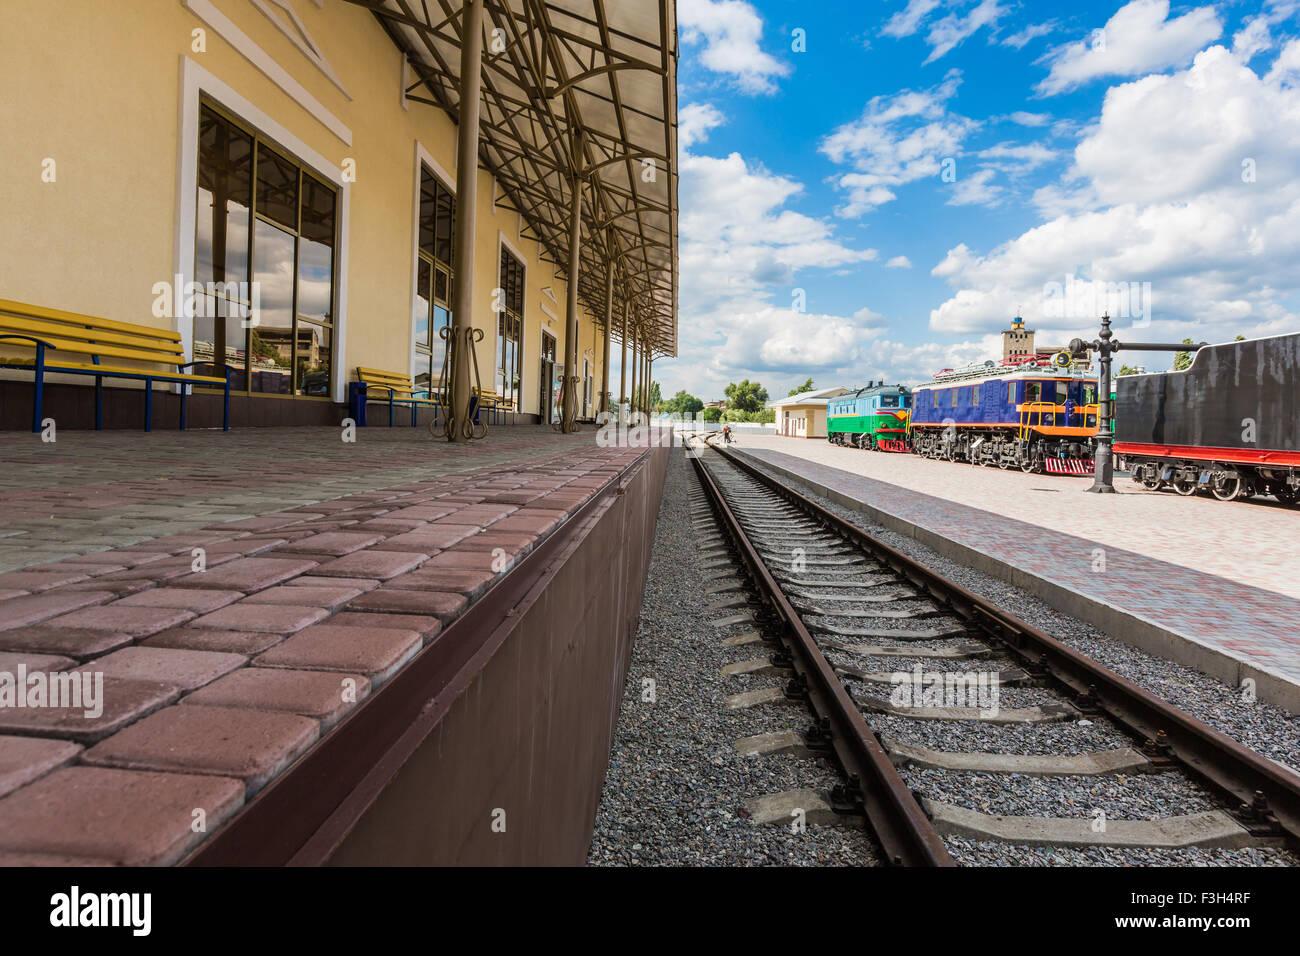 Vintage Railway Station Platform With Old Trains